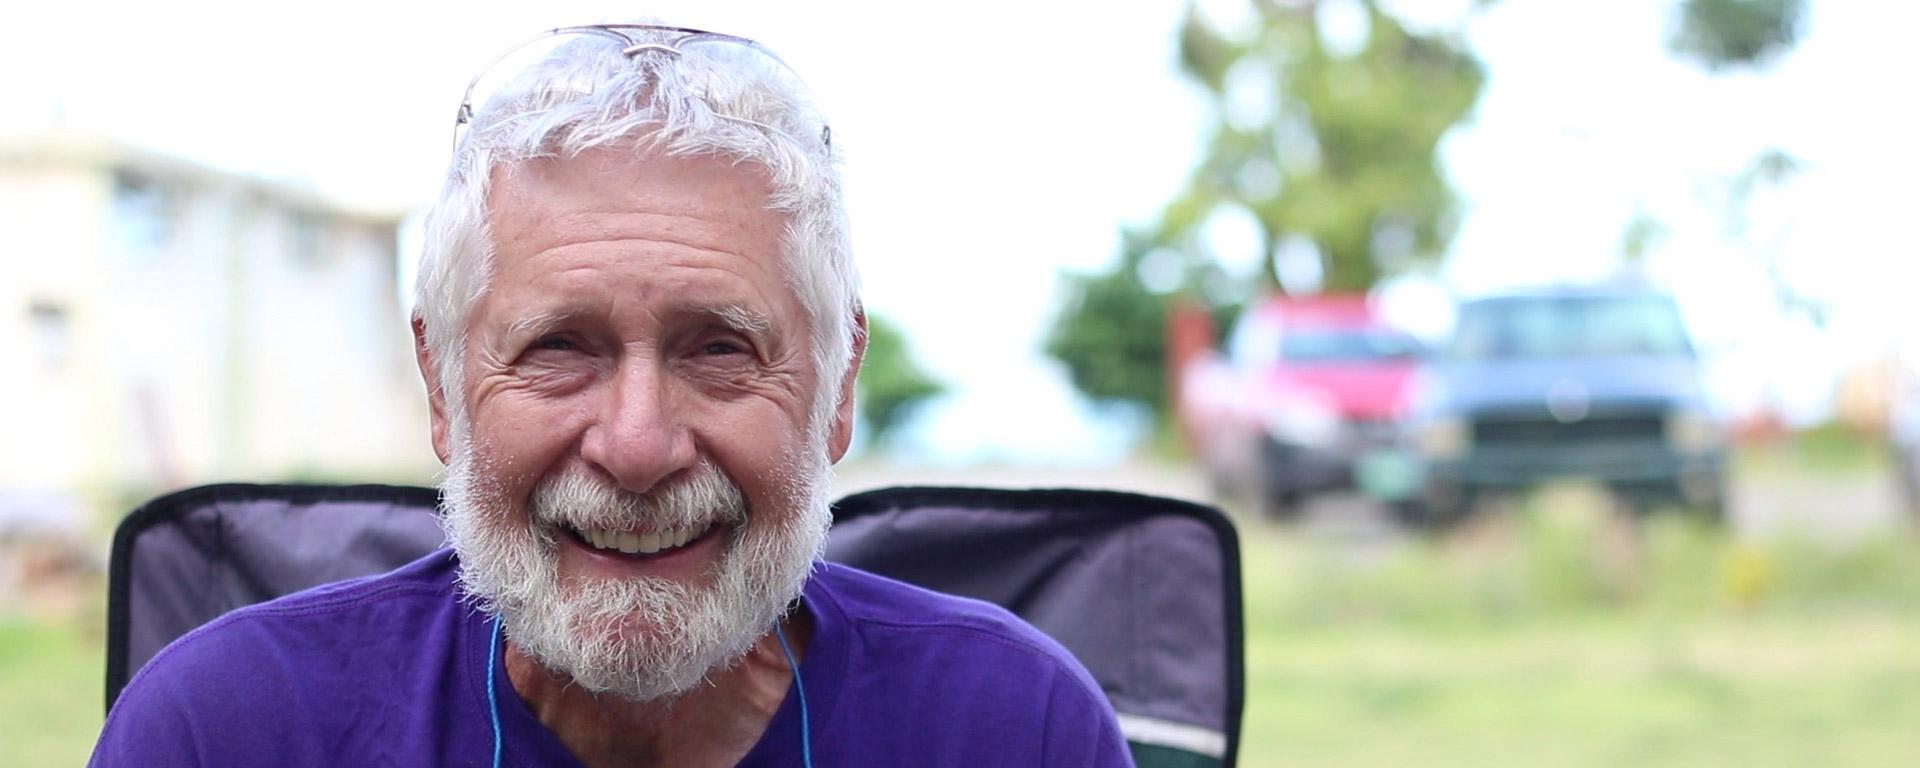 Volunteer Roger Smiling